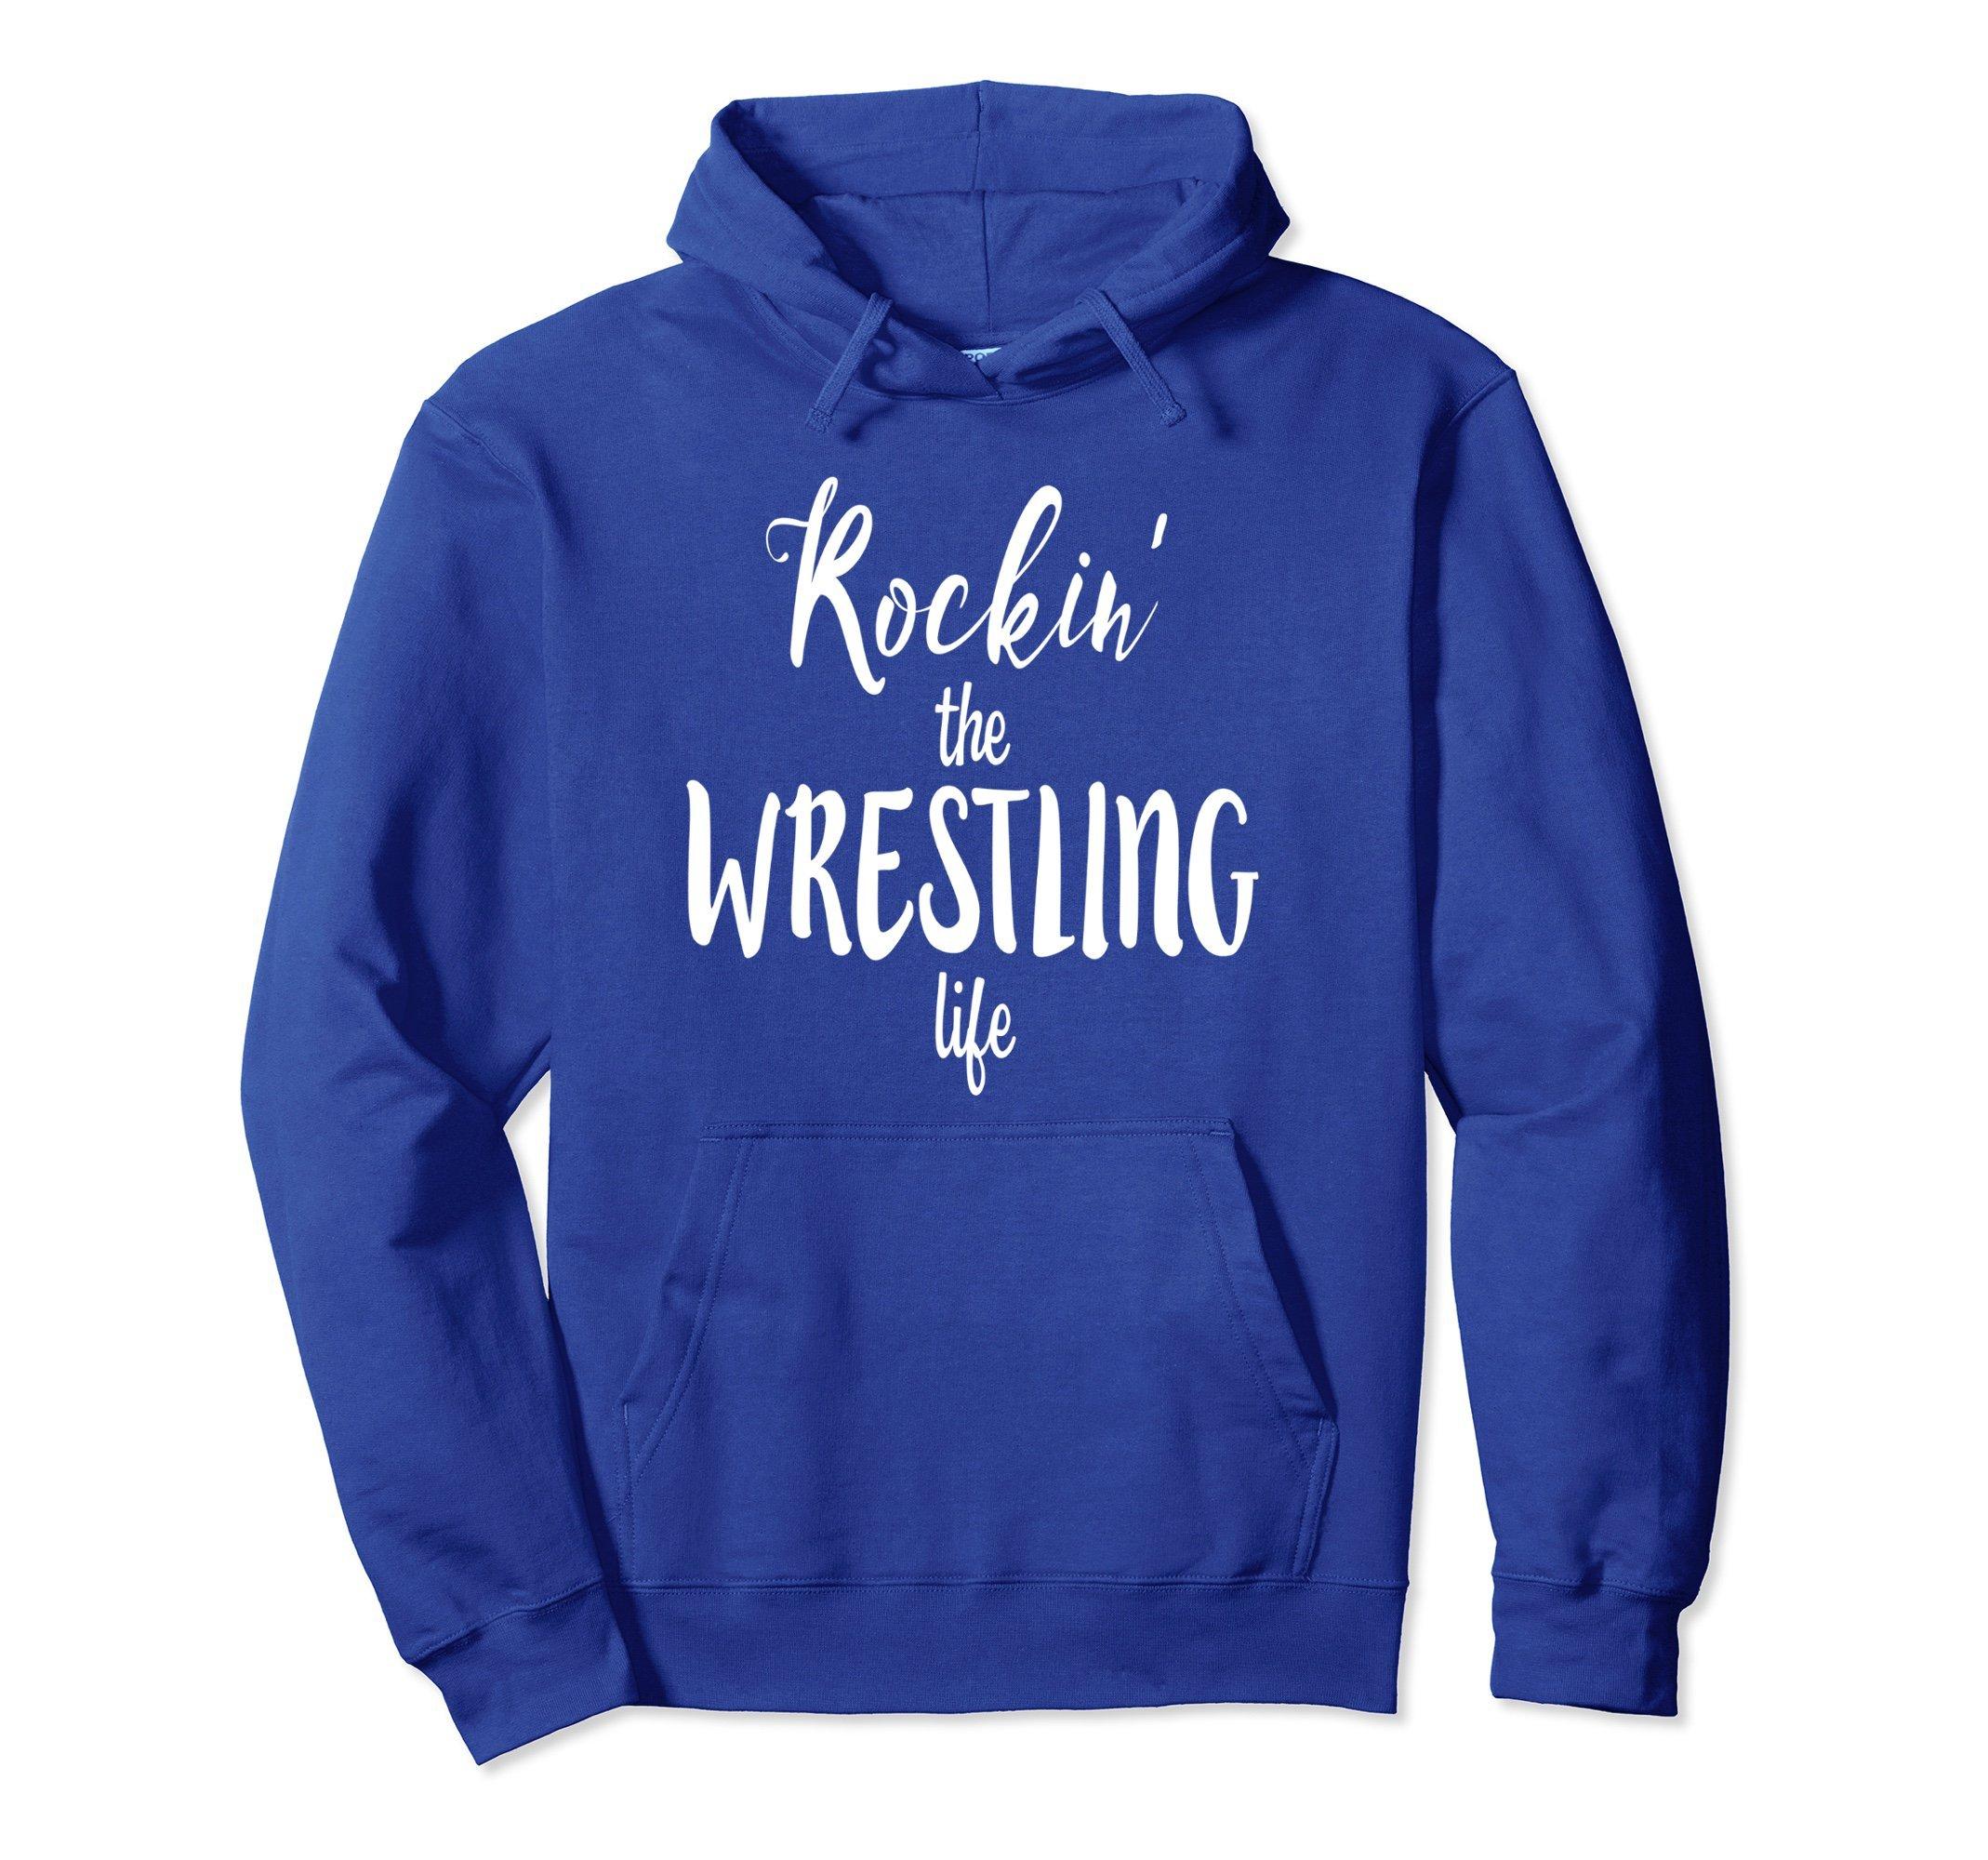 Unisex Rockin' the Wrestling Life Funny Wrestler HOODIE SWEATSHIRT 2XL Royal Blue